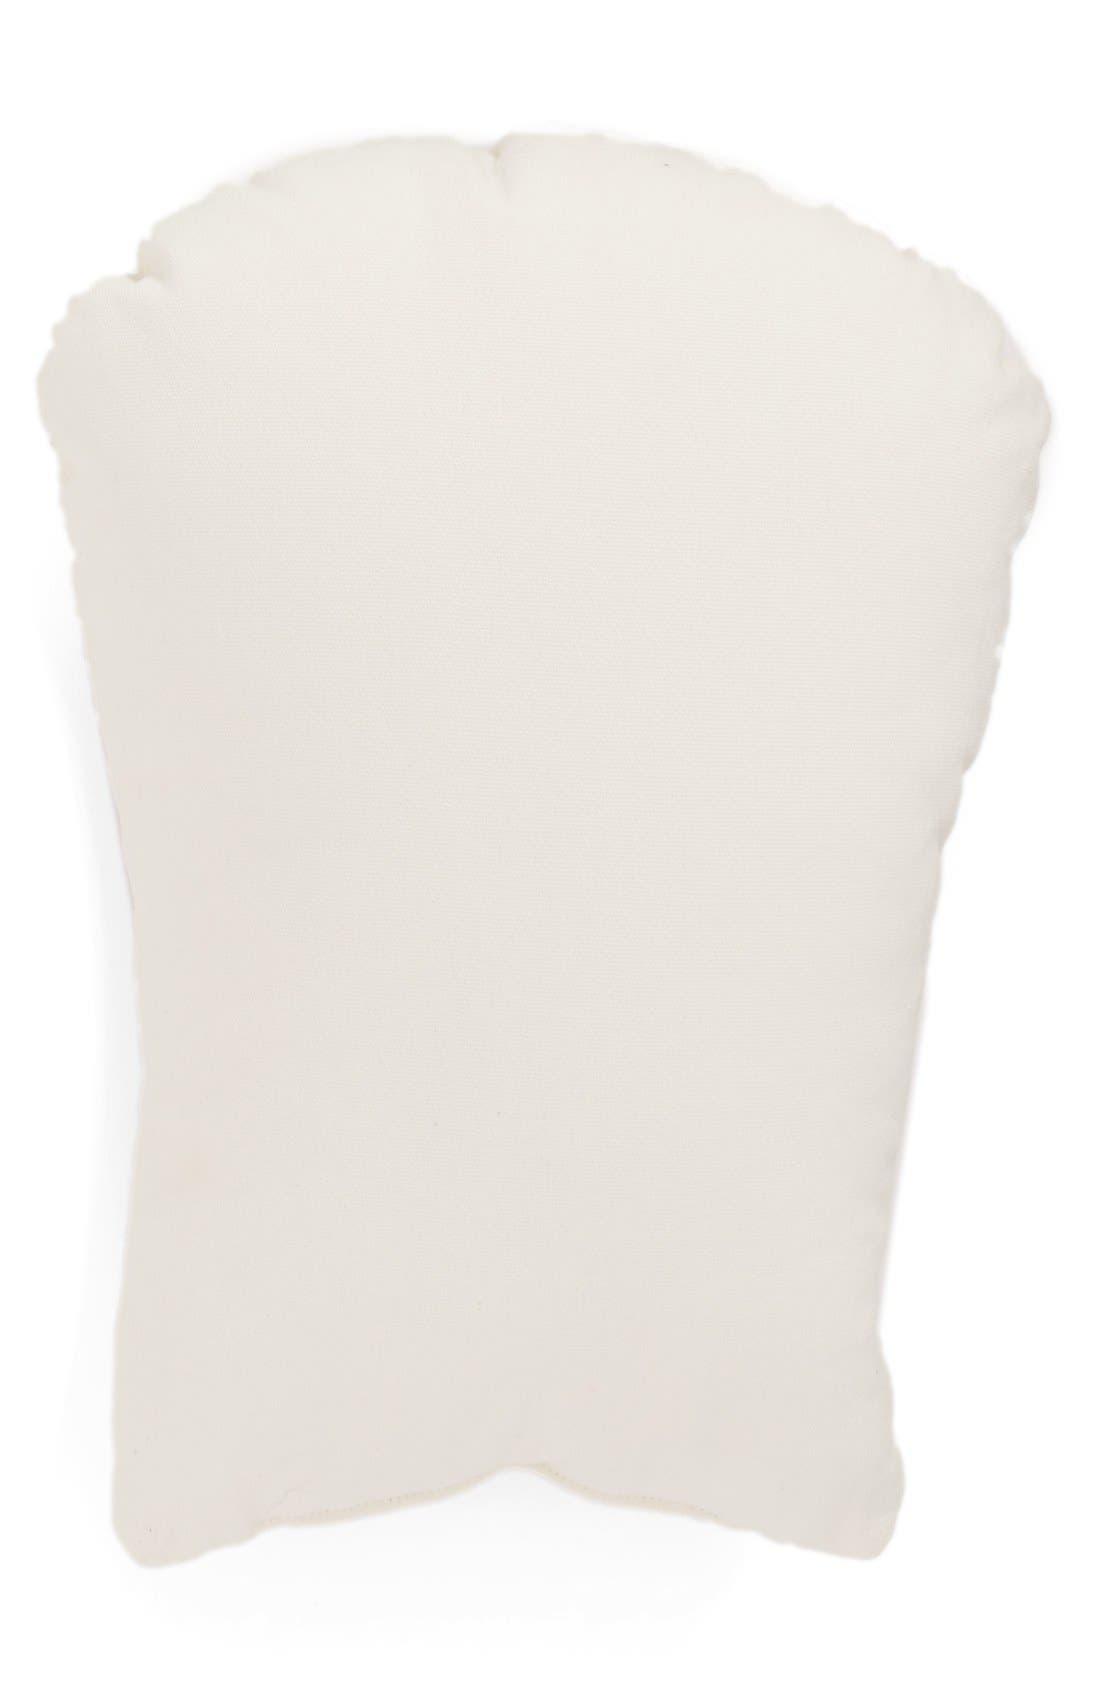 Alternate Image 2  - Levtex 'Popcorn' Accent Pillow